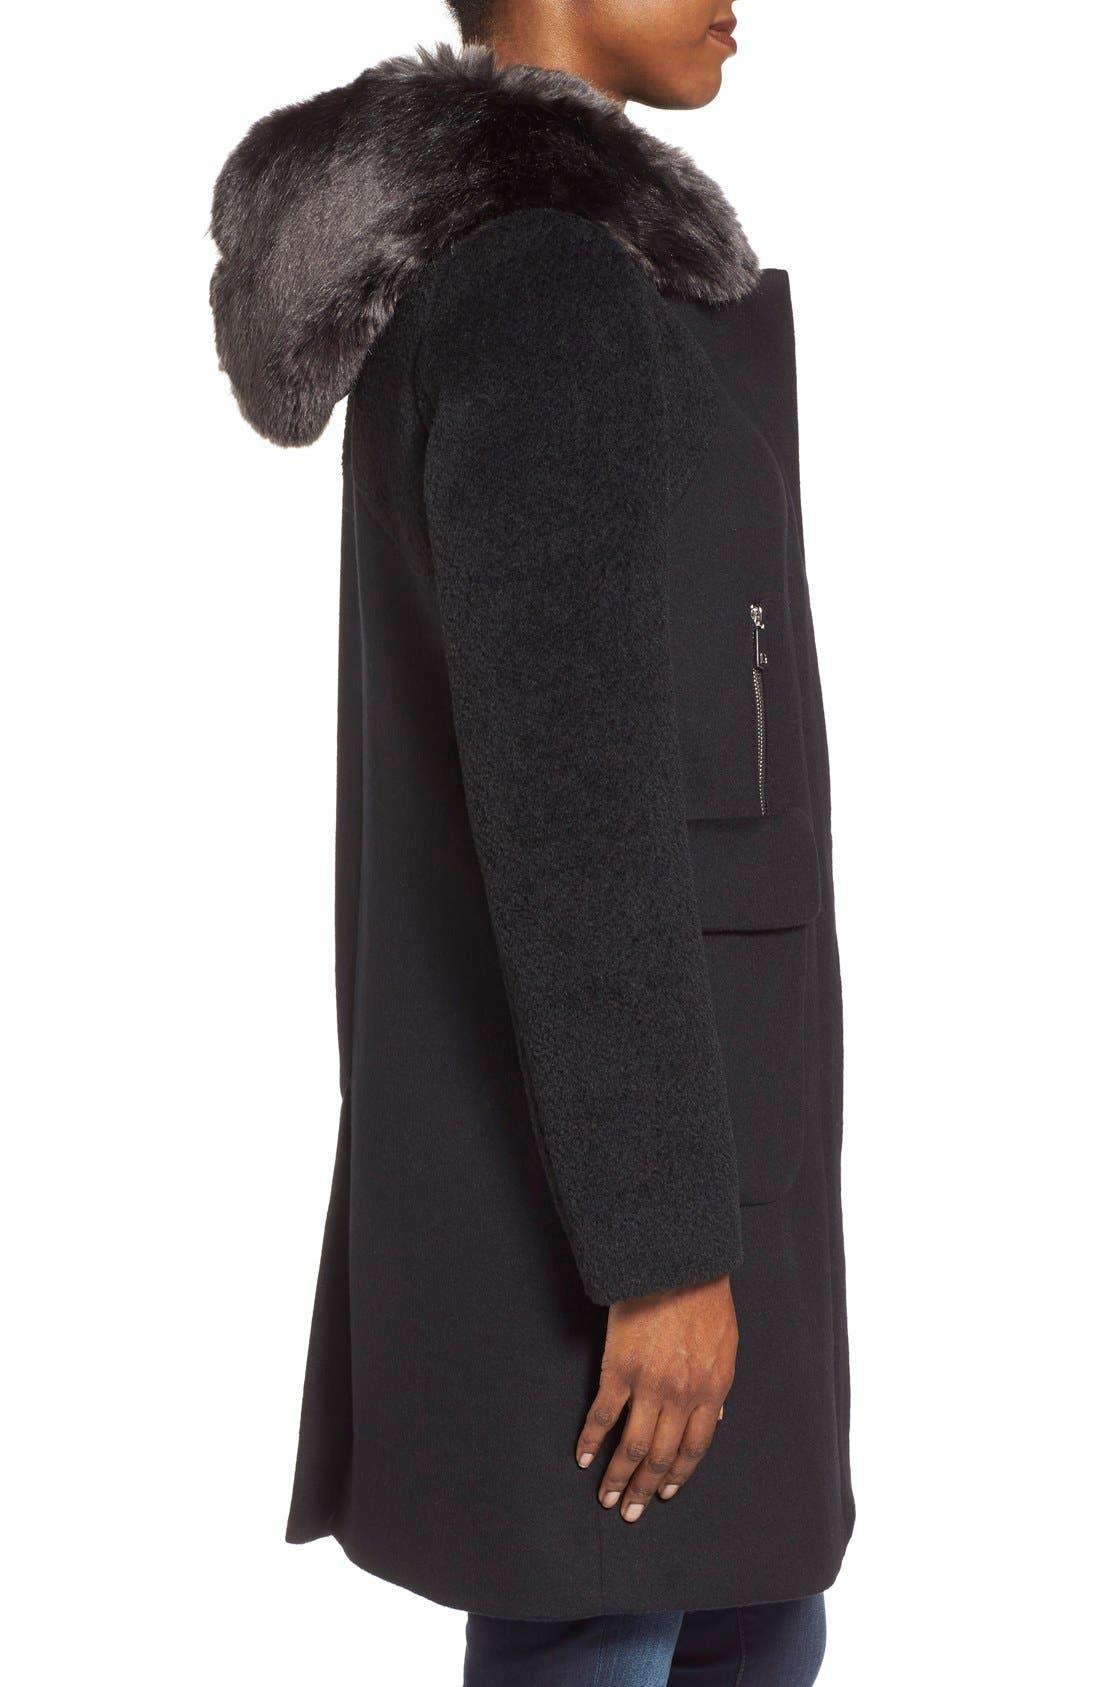 Alternate Image 3  - Dawn Levy 'Lara' Mixed Media Wool Blend Coat withFauxFur Hood